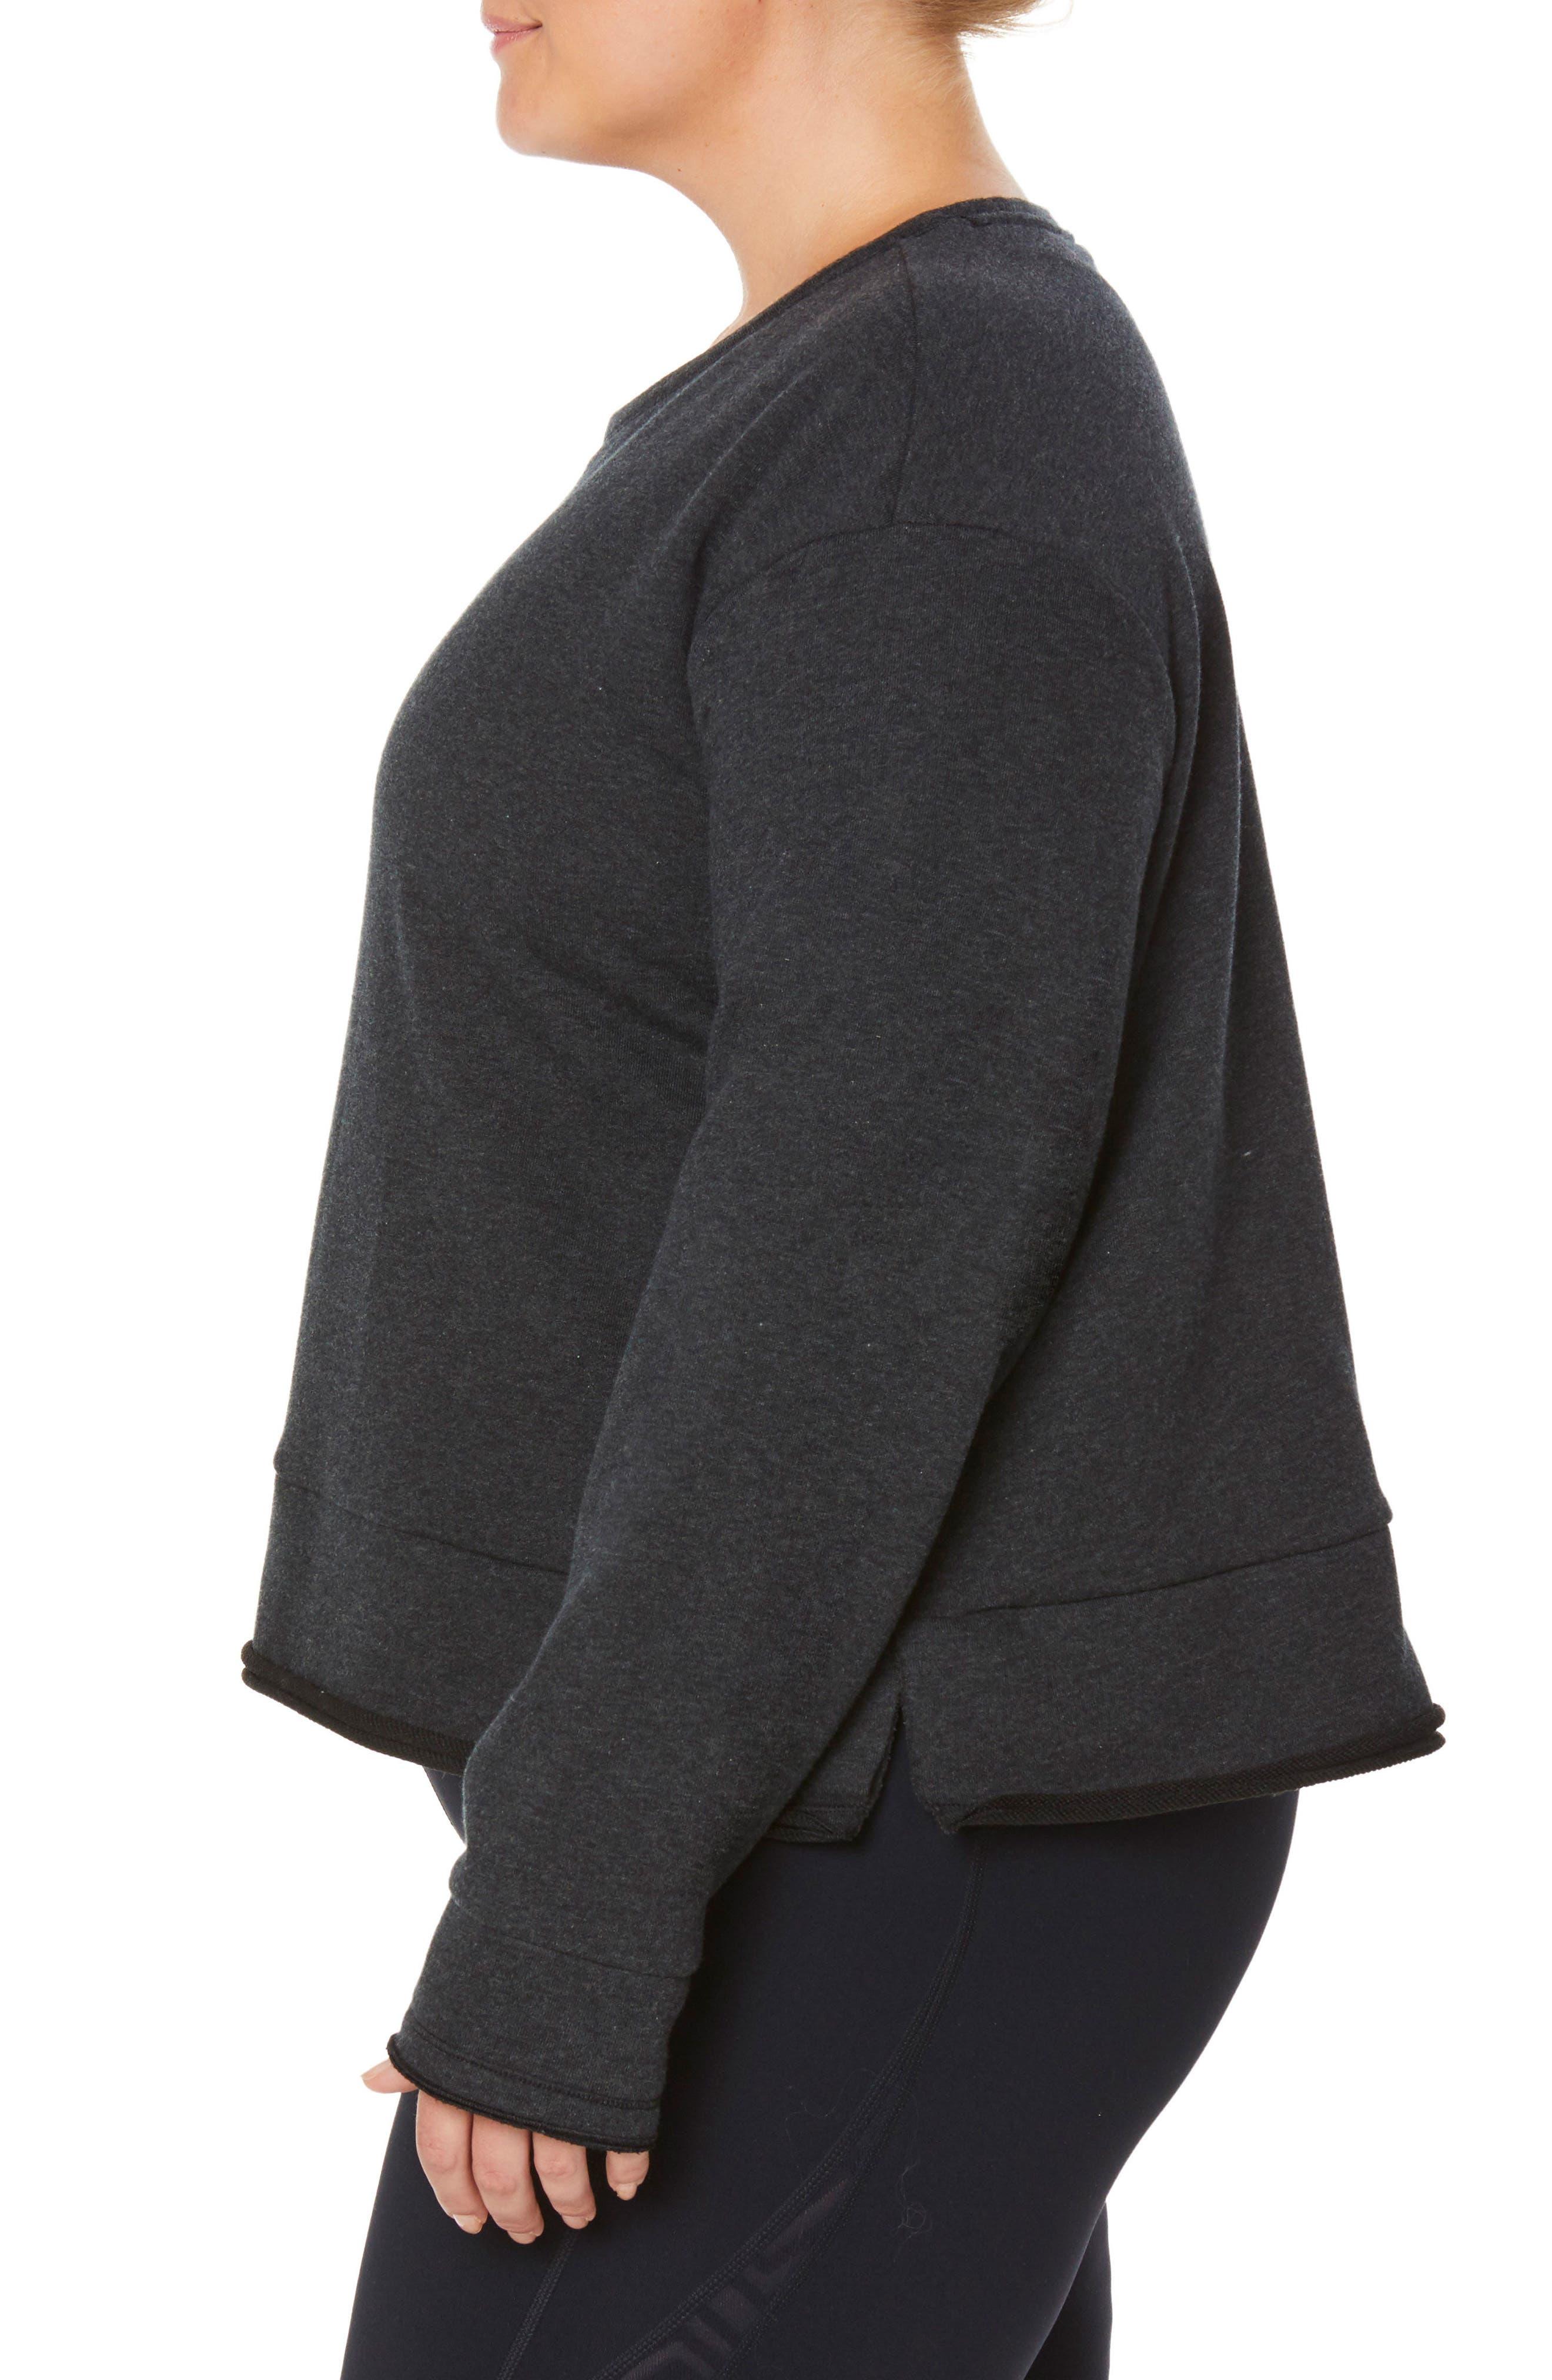 Shape Extended Day Sweatshirt,                             Alternate thumbnail 3, color,                             CHARCOAL BLACK